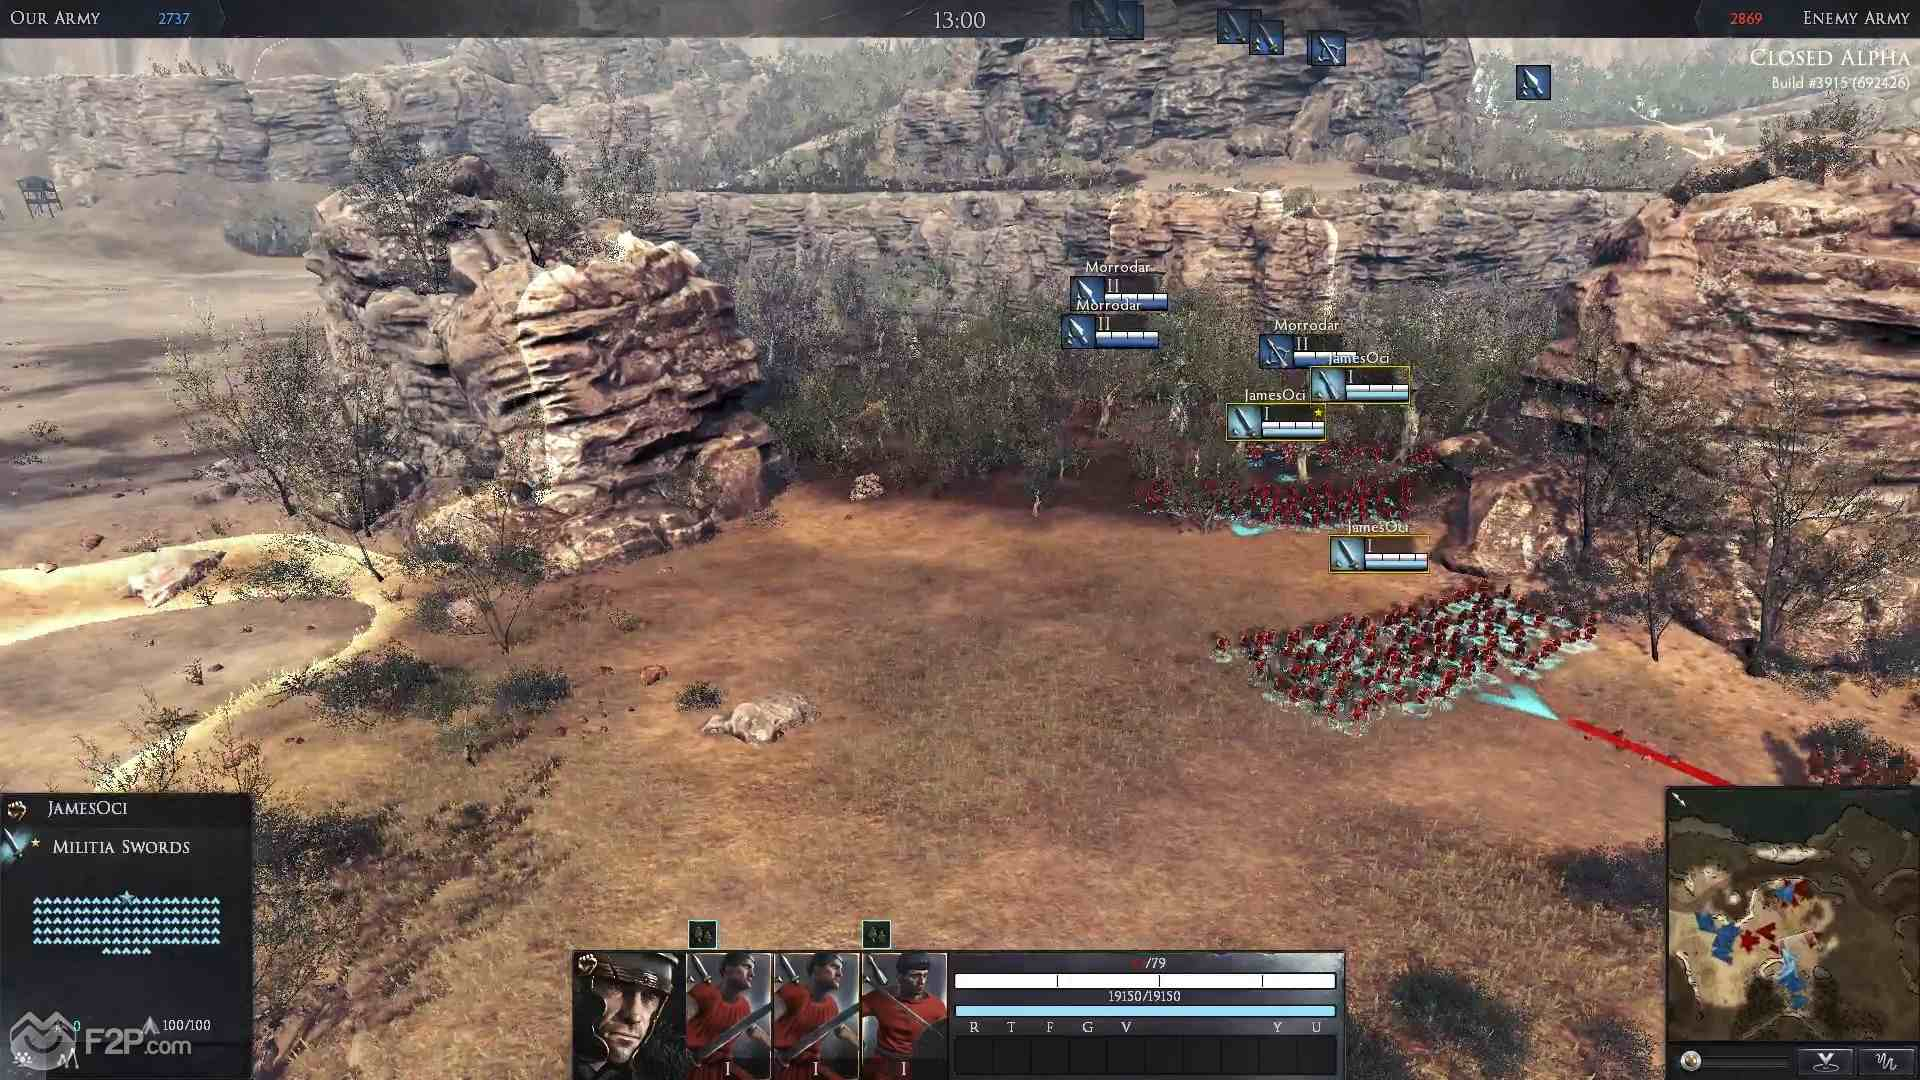 wargaming will publish total war arena